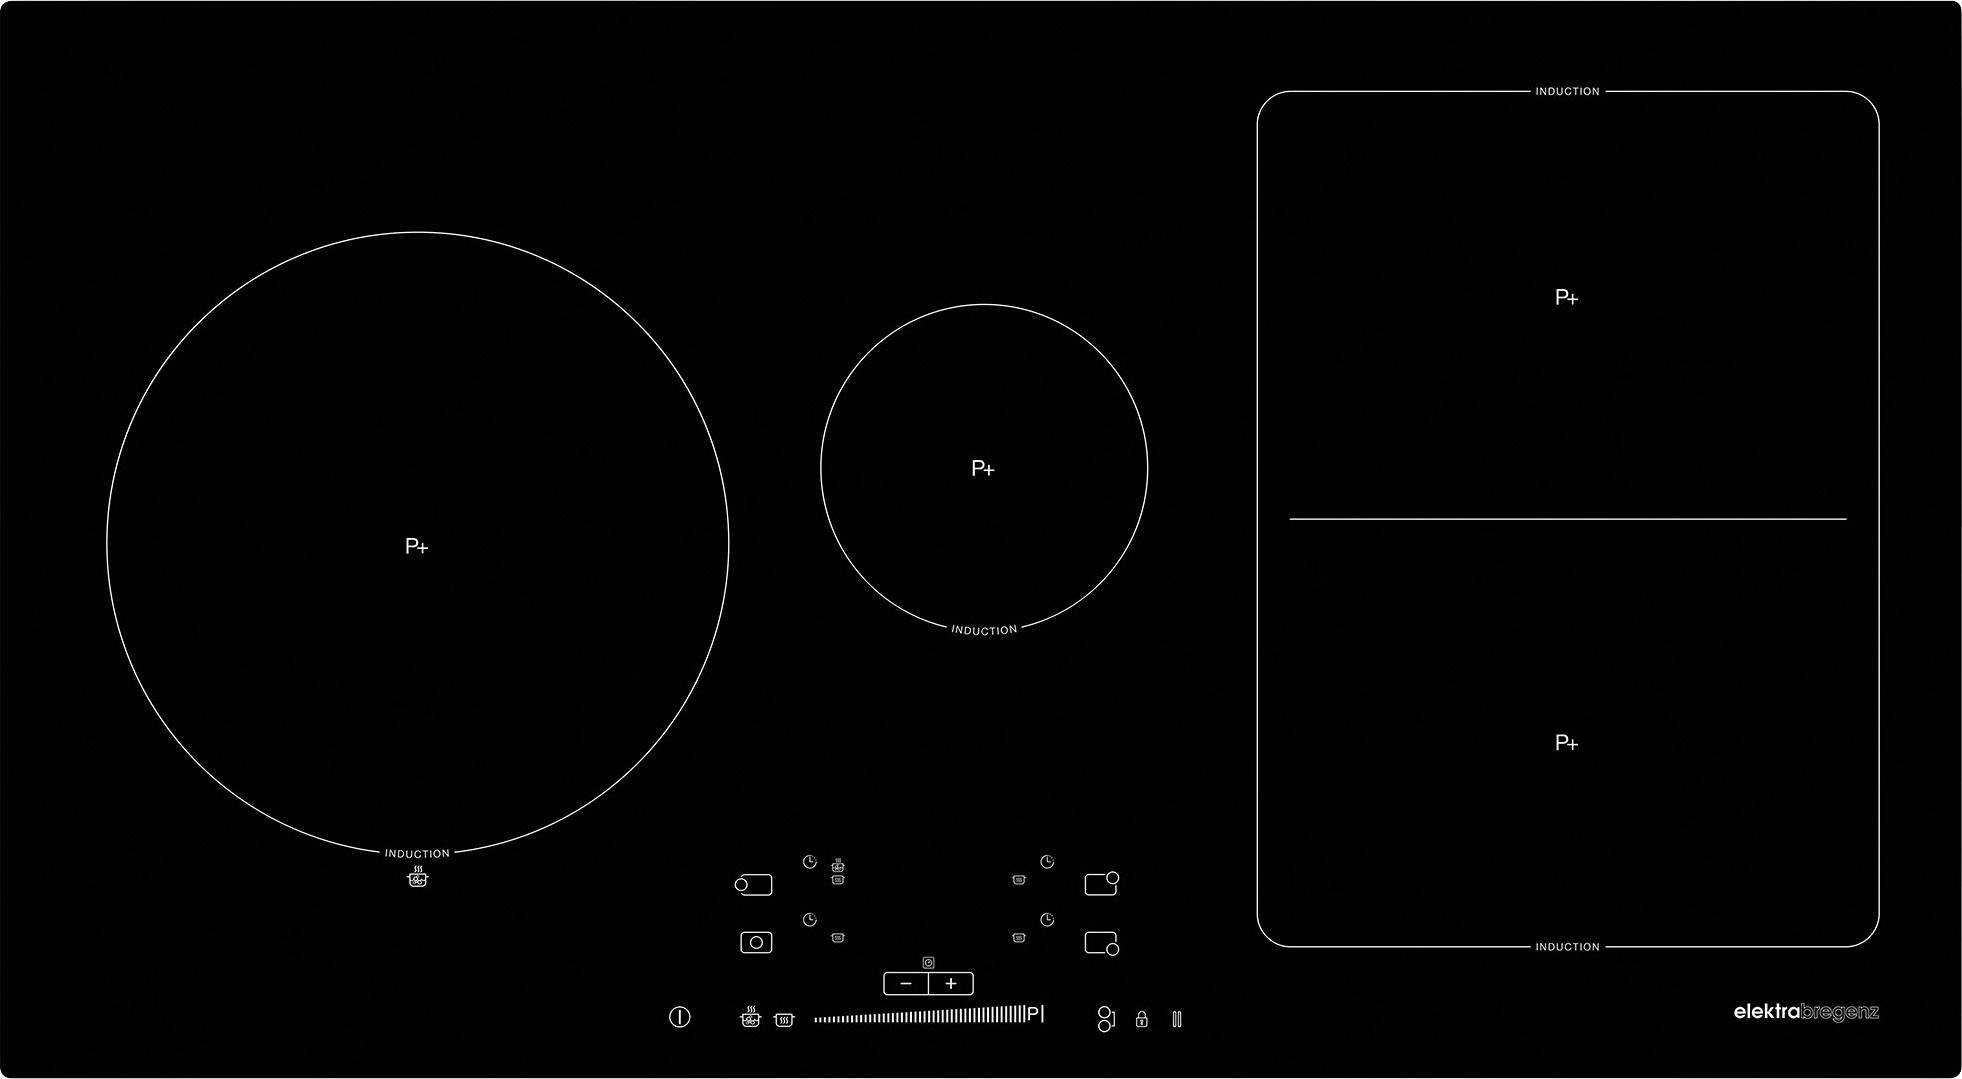 kochfeld ceran 90cm glaskeramik kochfeld autark cm g nstig kaufen ebay aeg ceranfeld autark. Black Bedroom Furniture Sets. Home Design Ideas